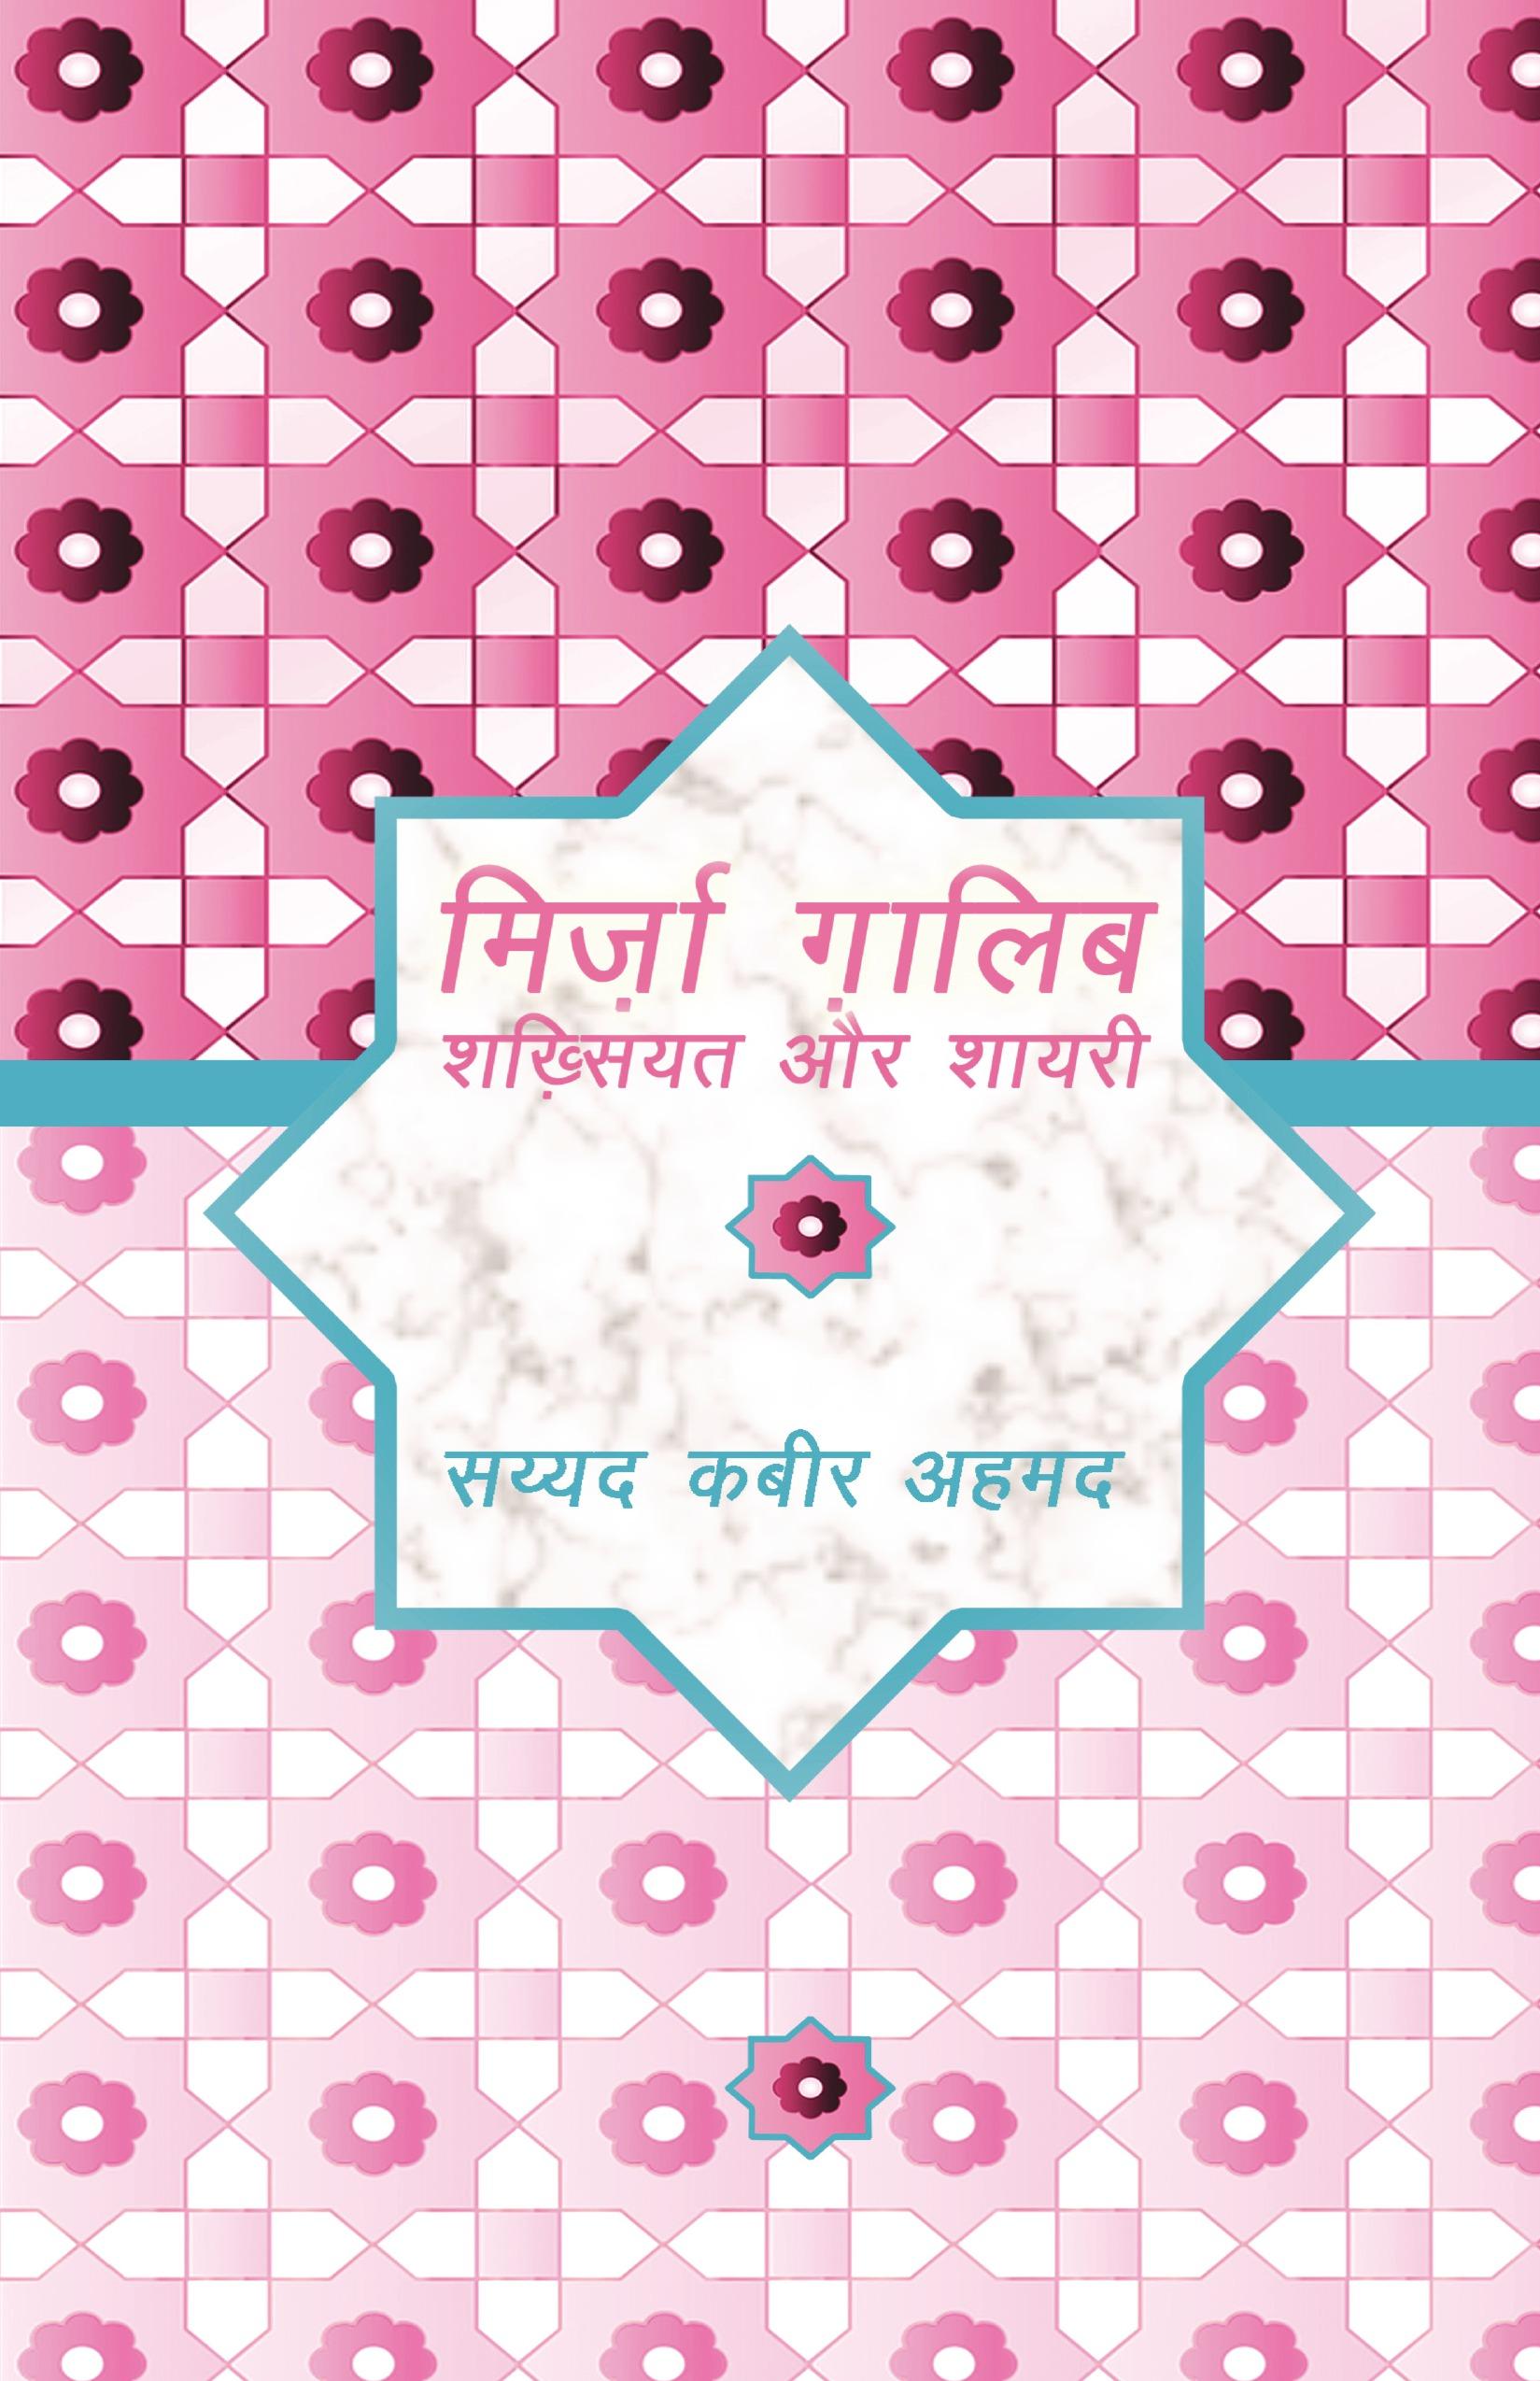 Mirza Ghalib - shakhsiyat aur shayari | Pothi com